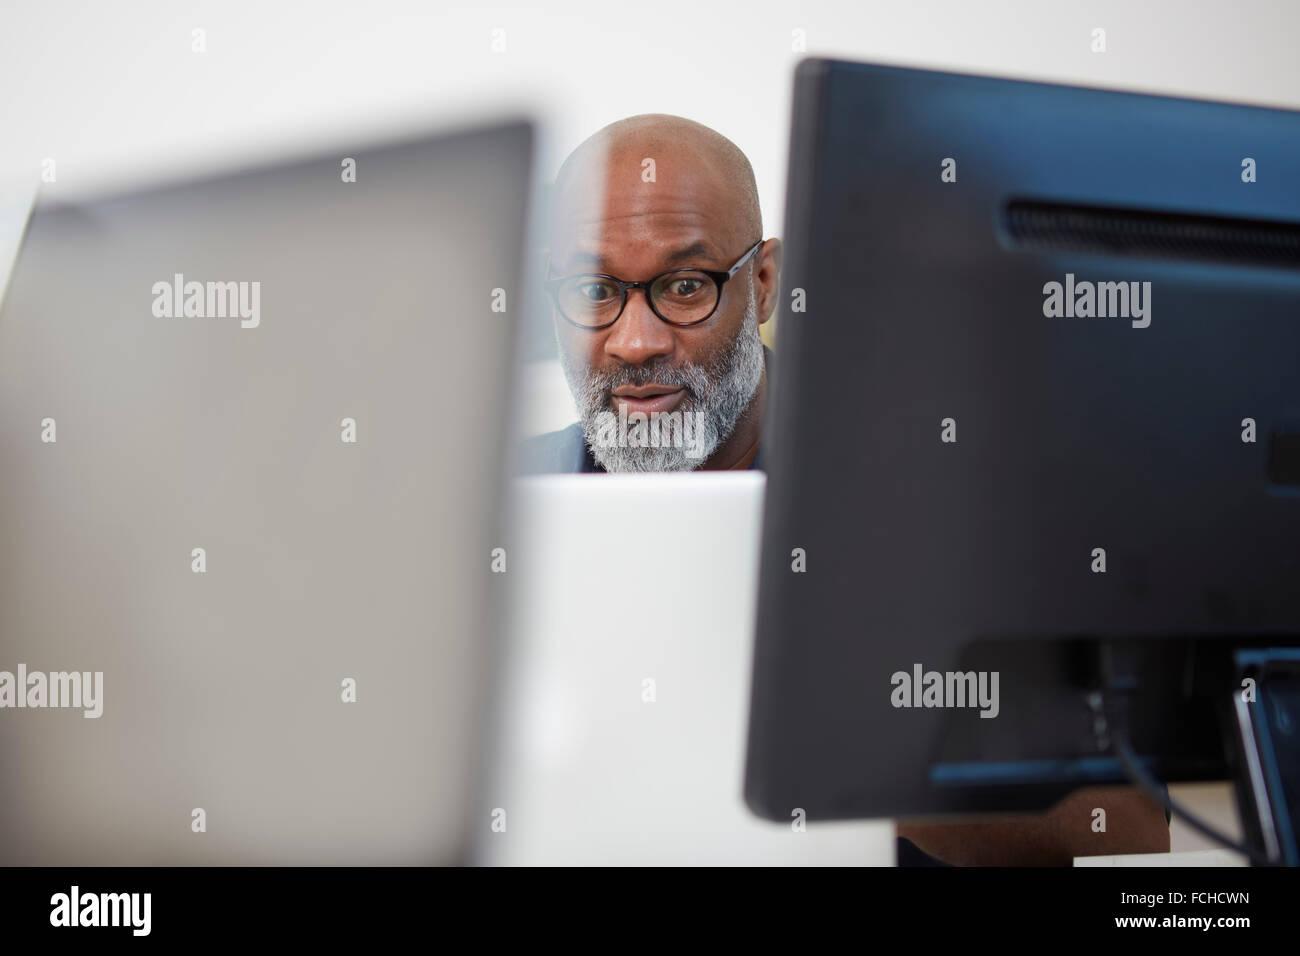 Portrait of astonished man between computer monitors - Stock Image